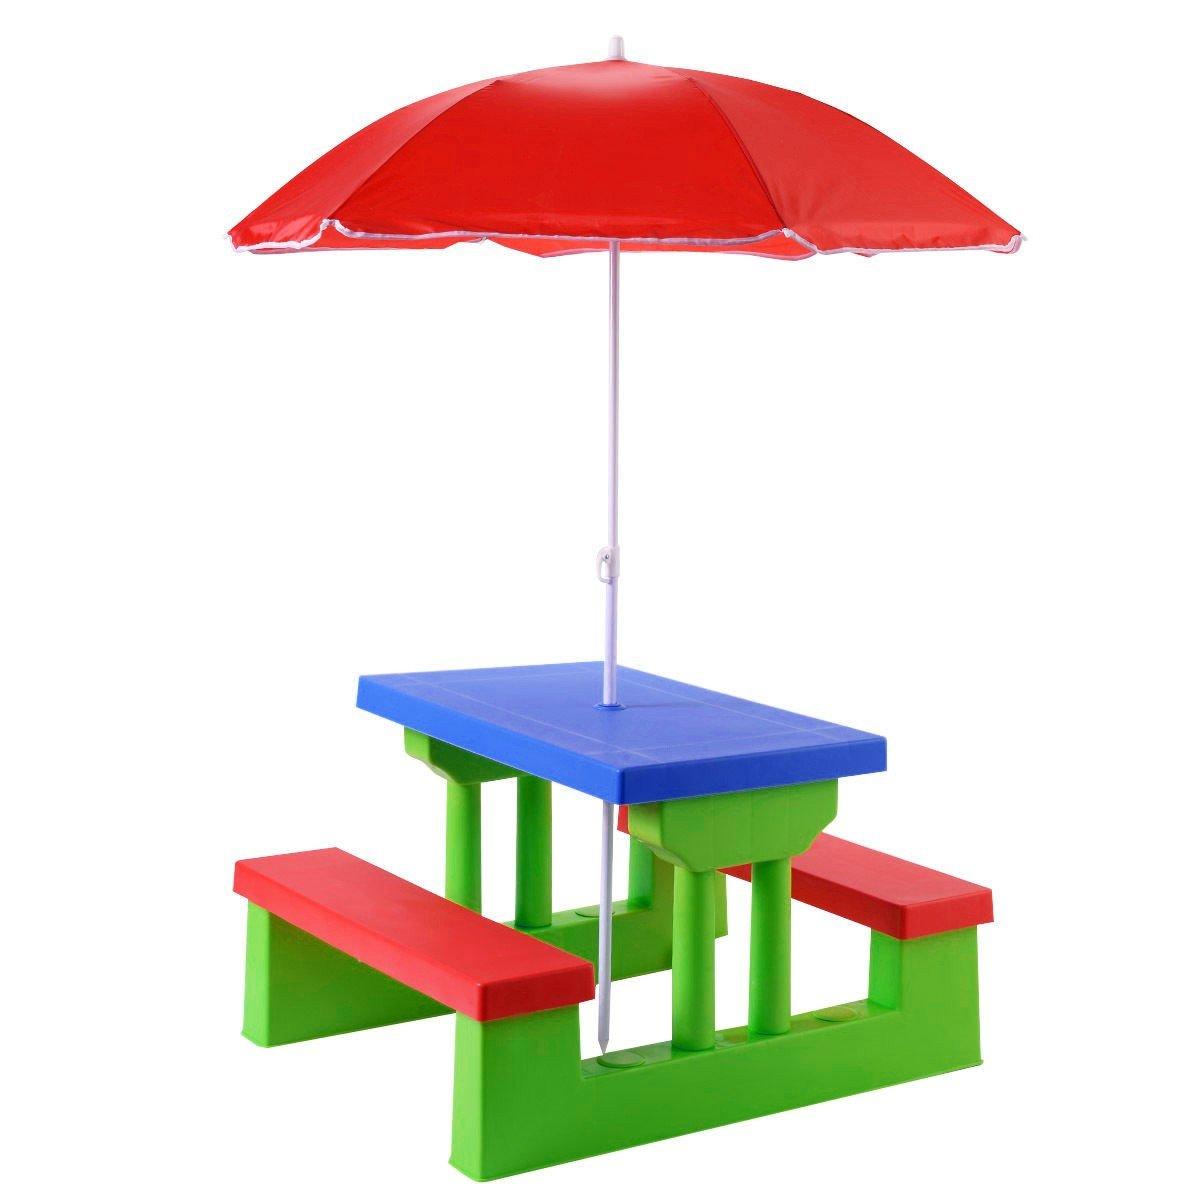 Patio Set Kids Picnic Table Bench Umbrella Perfect Outdoor / Indoor Children Garden Furniture & e-Book jn.widetrade